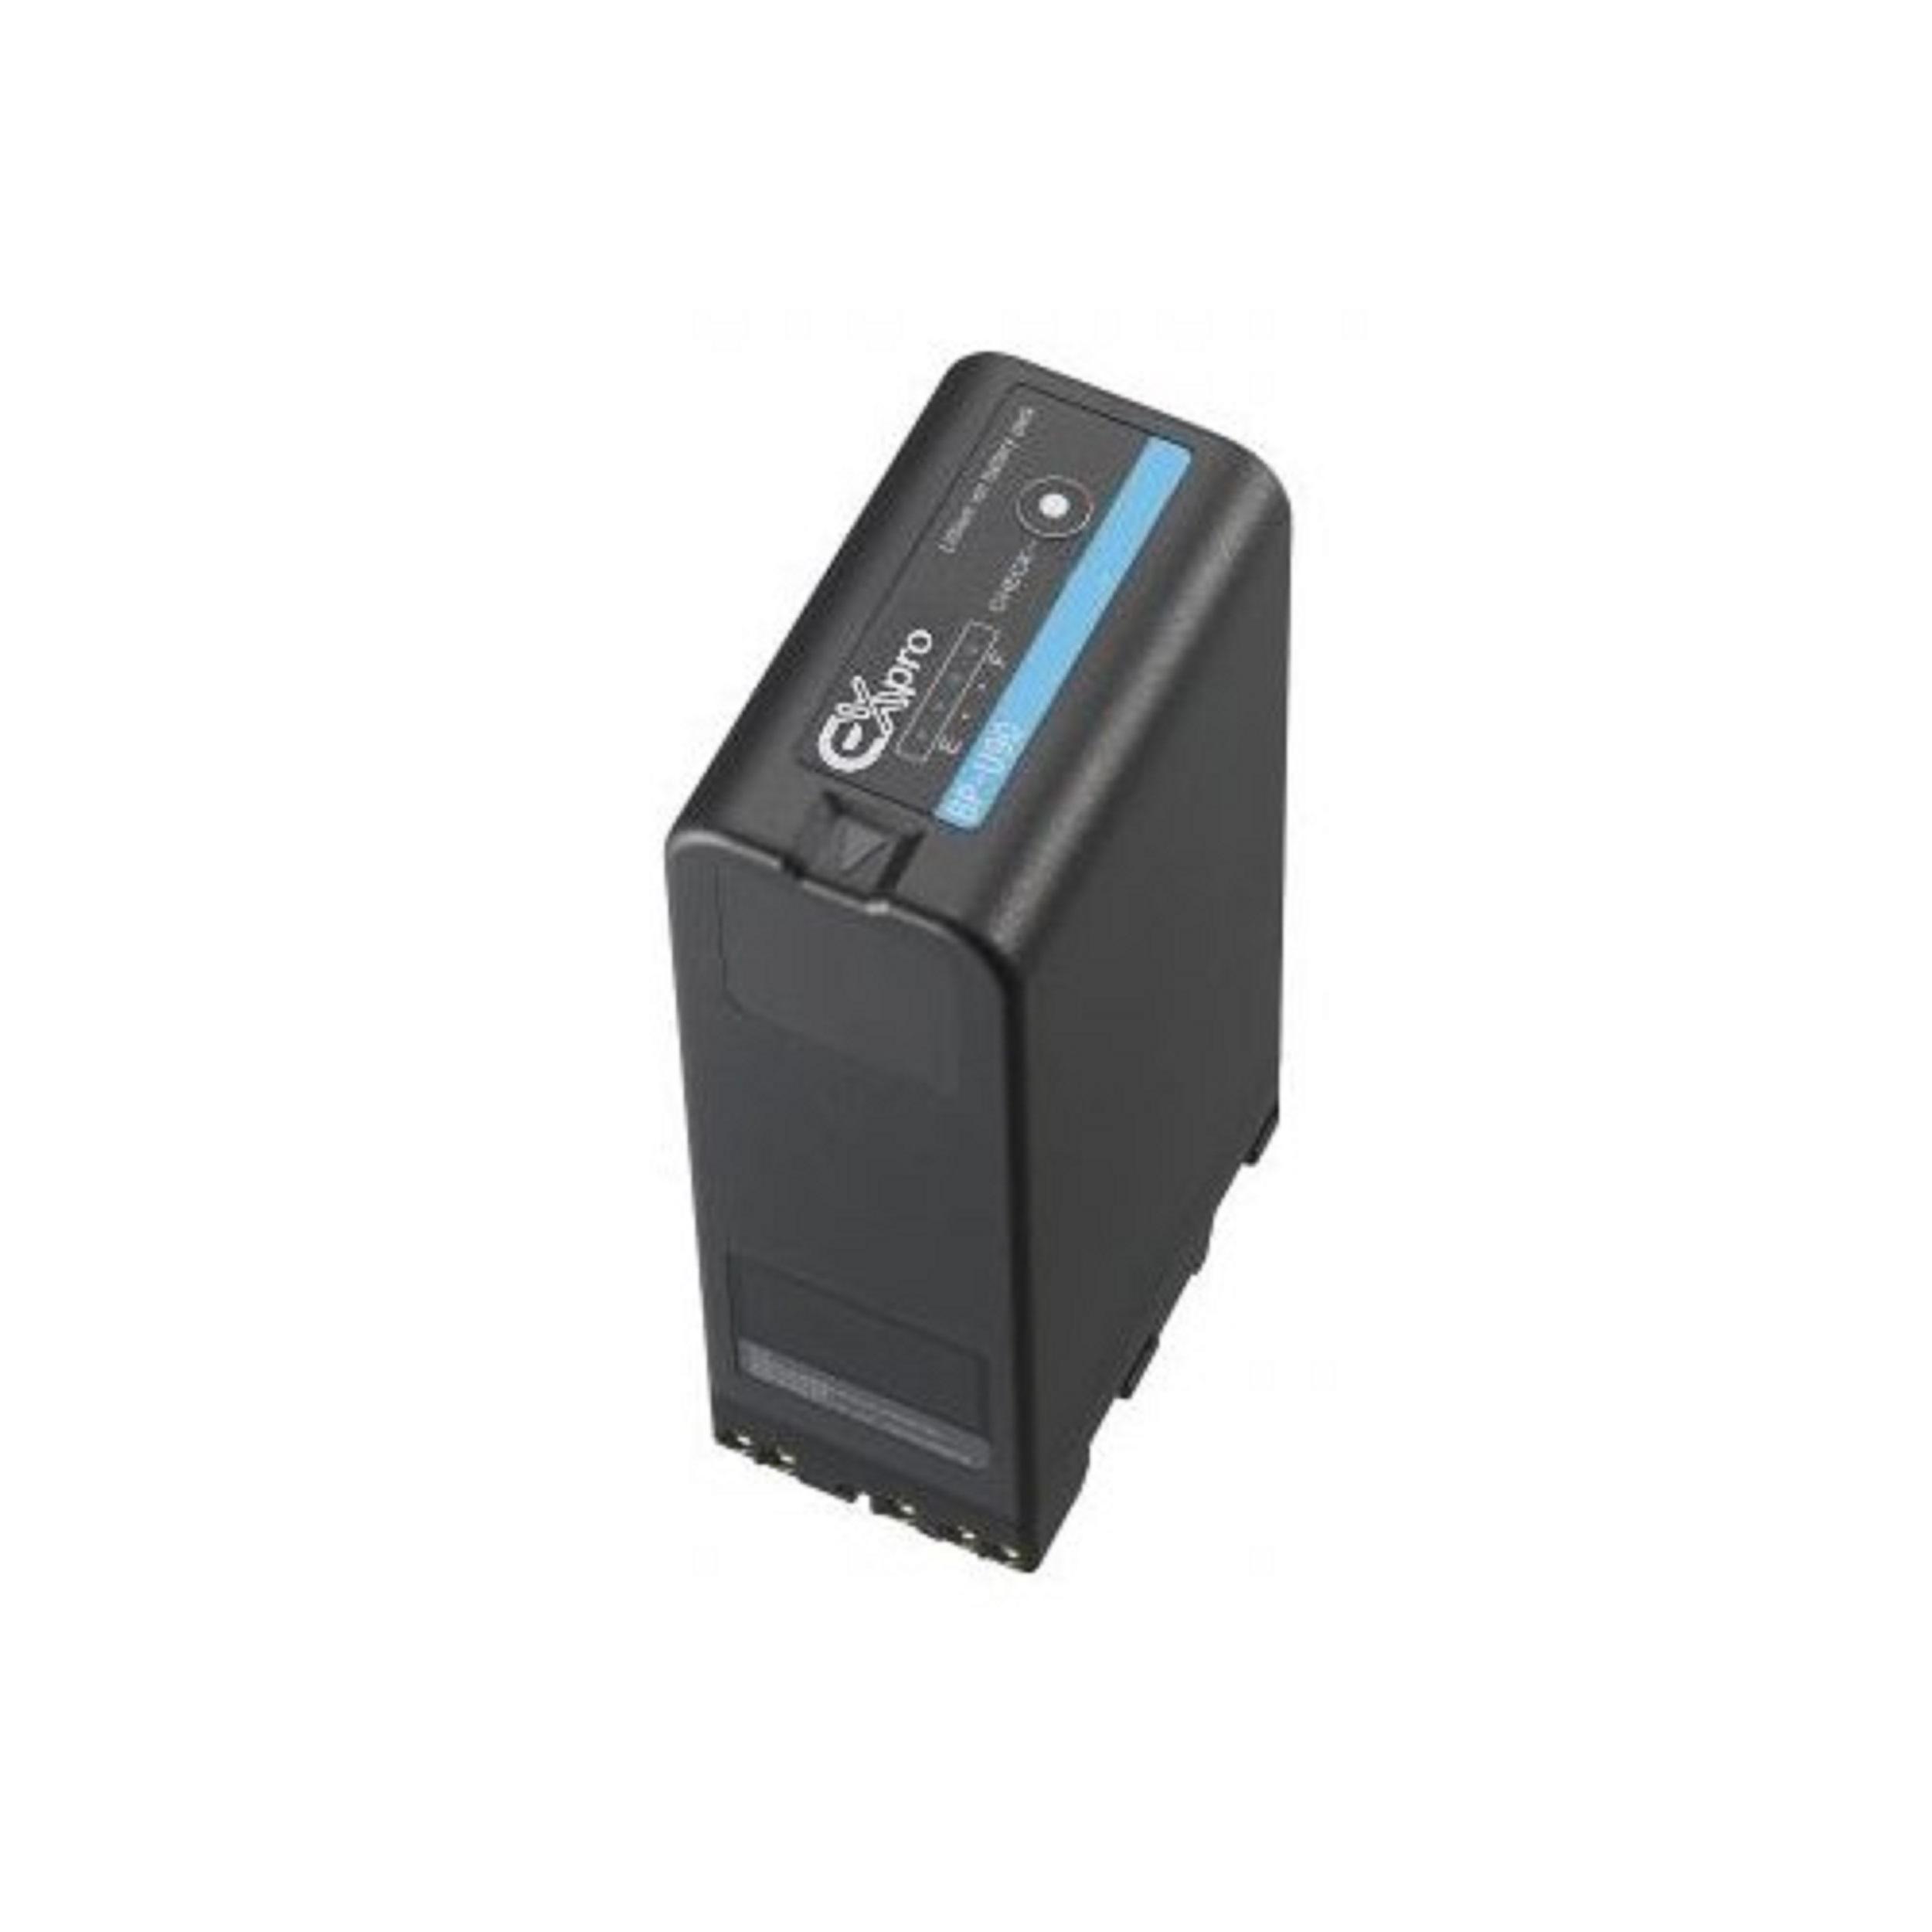 Ex-Pro Digital Camera Battery BP-U90 BPU90 for Sony PMW-200 PMW-300 PMW-300K1